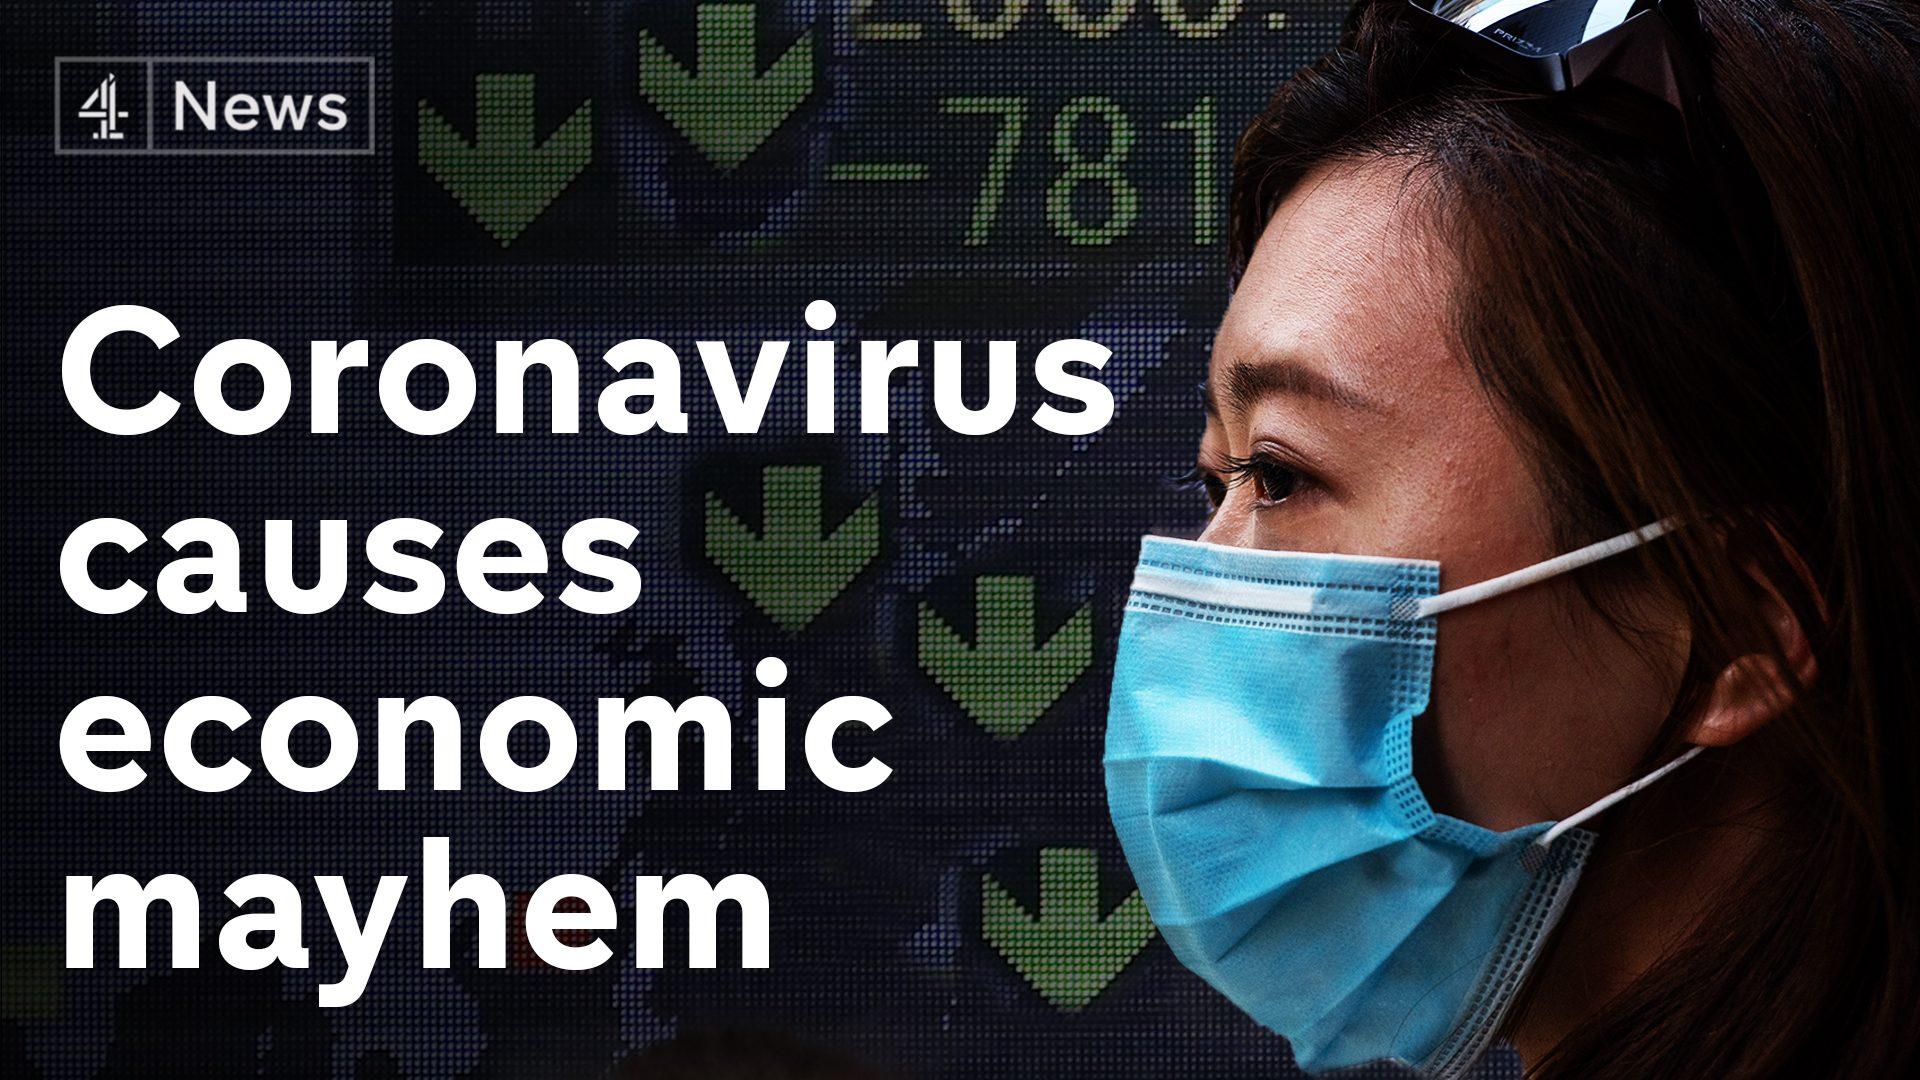 Coronavirus spread triggers economic downturn fears - channel 4